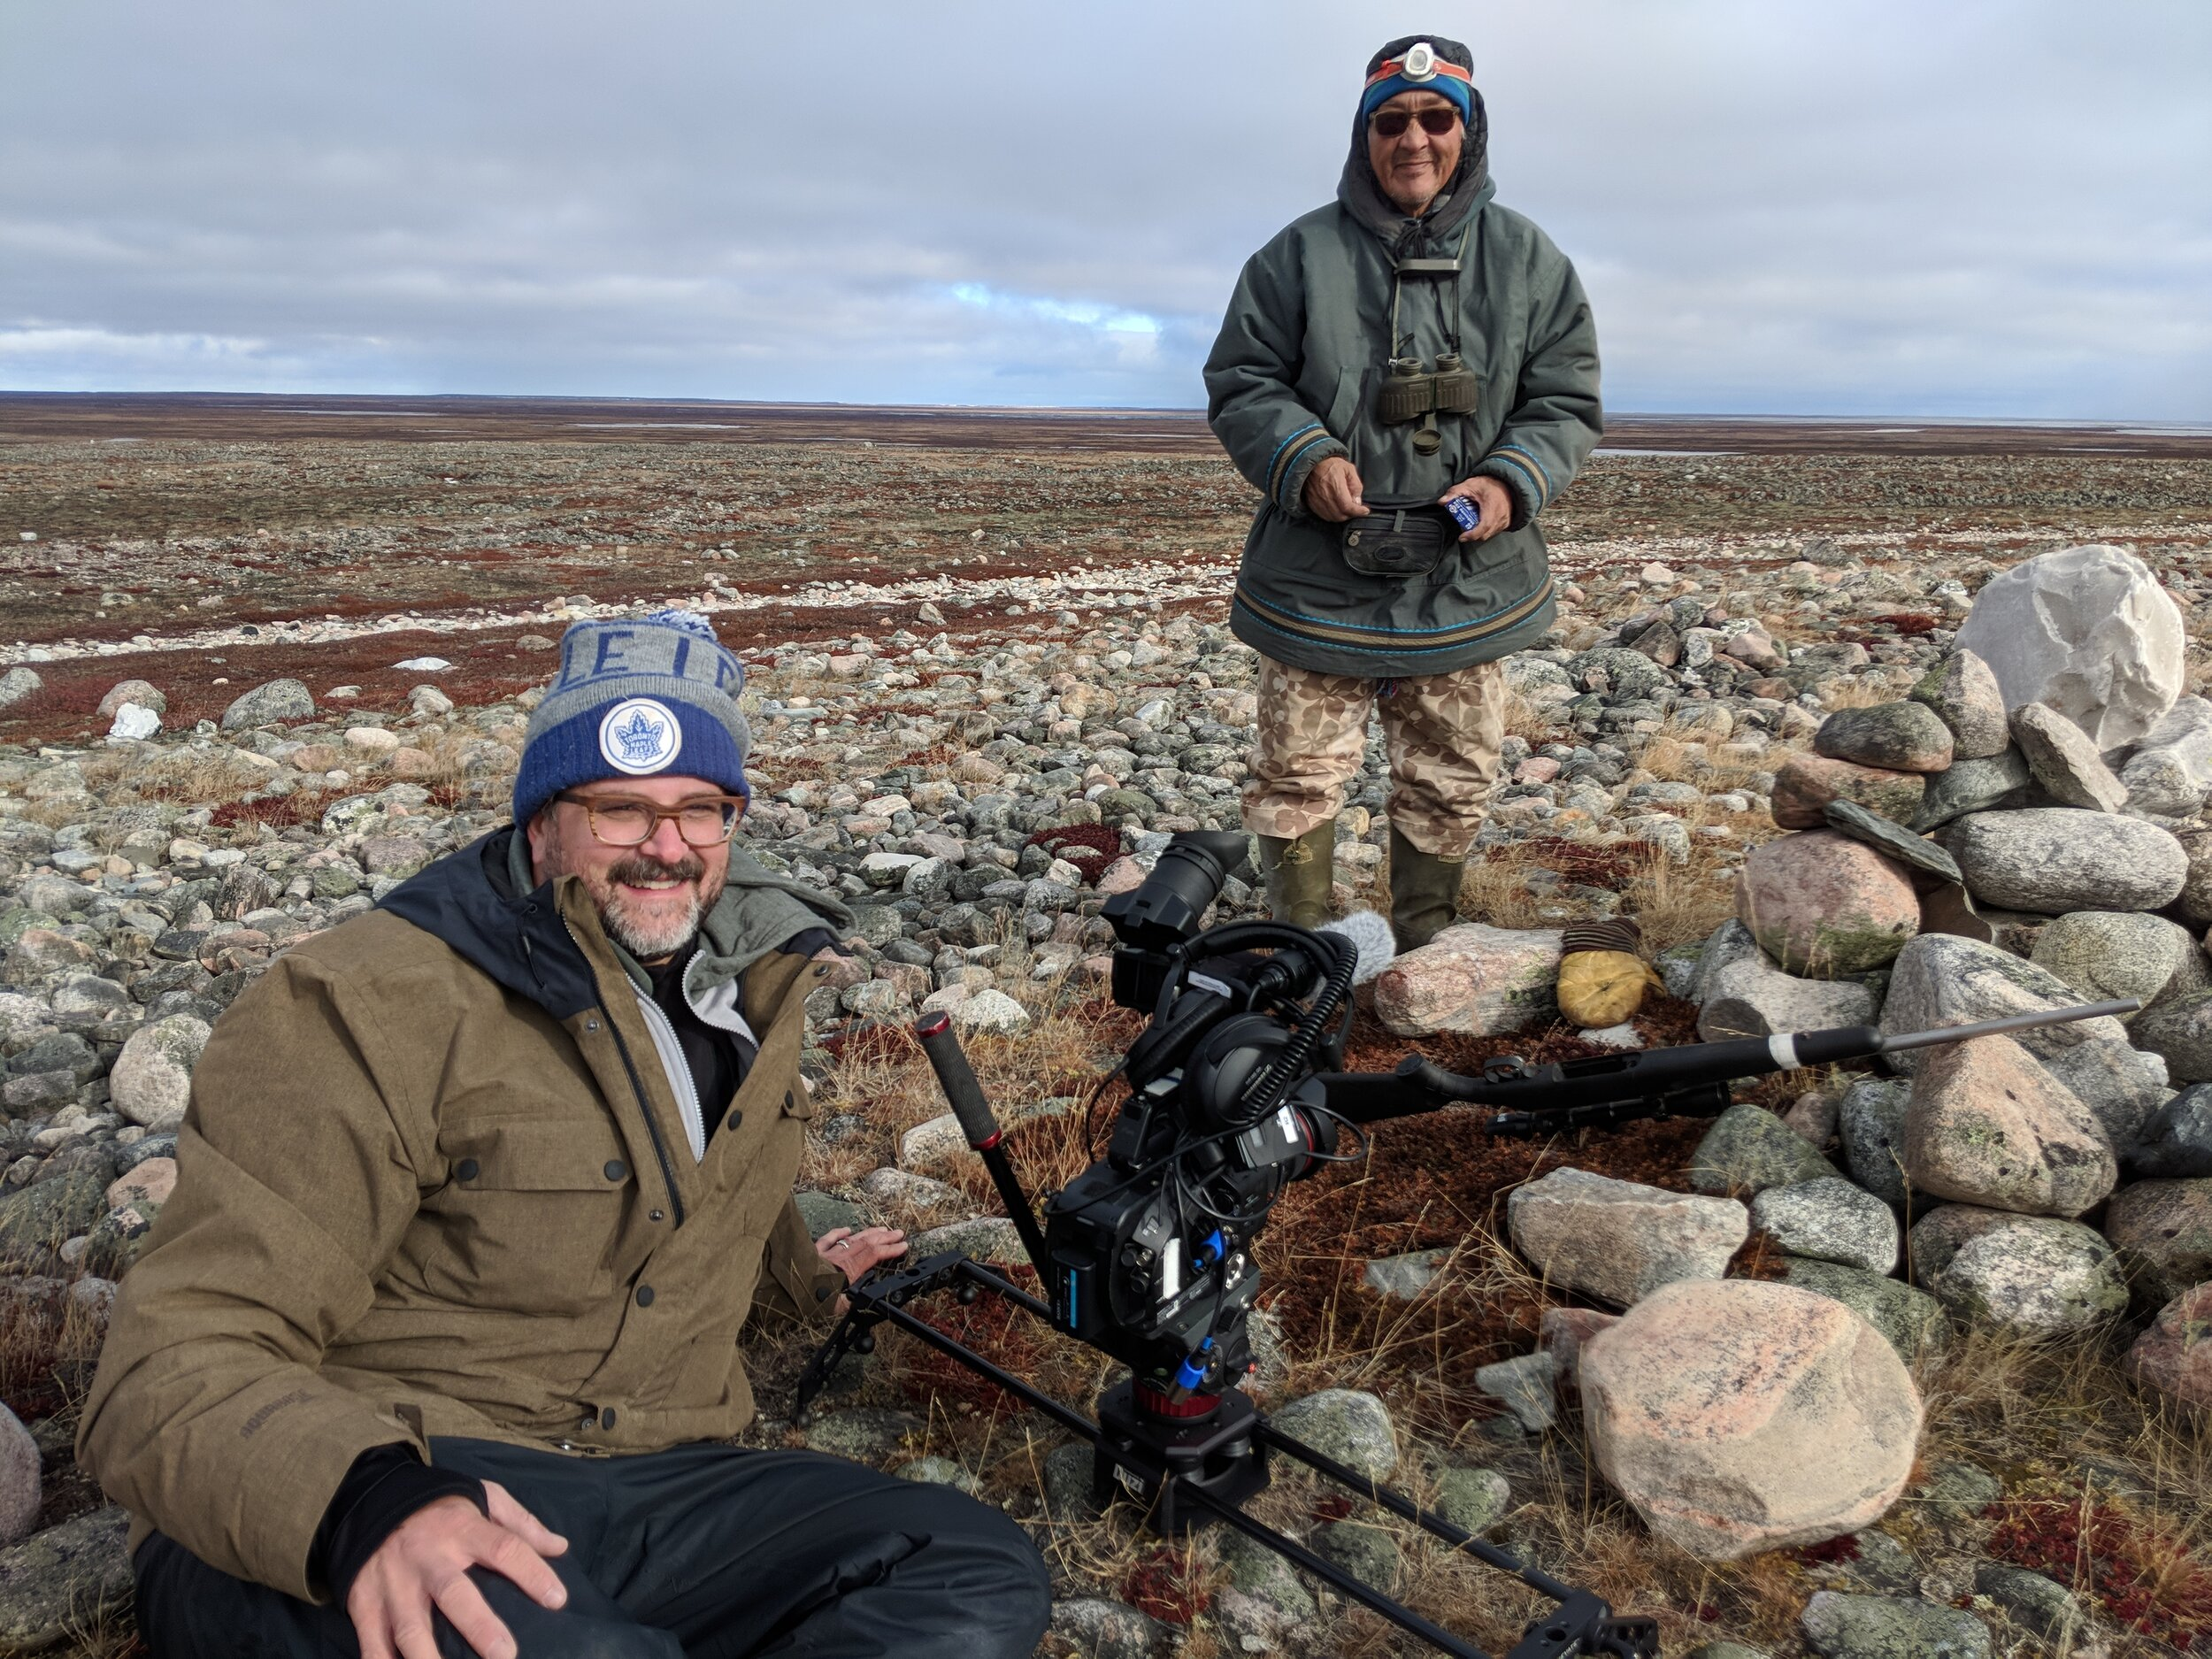 On location in Nunavut, Canada